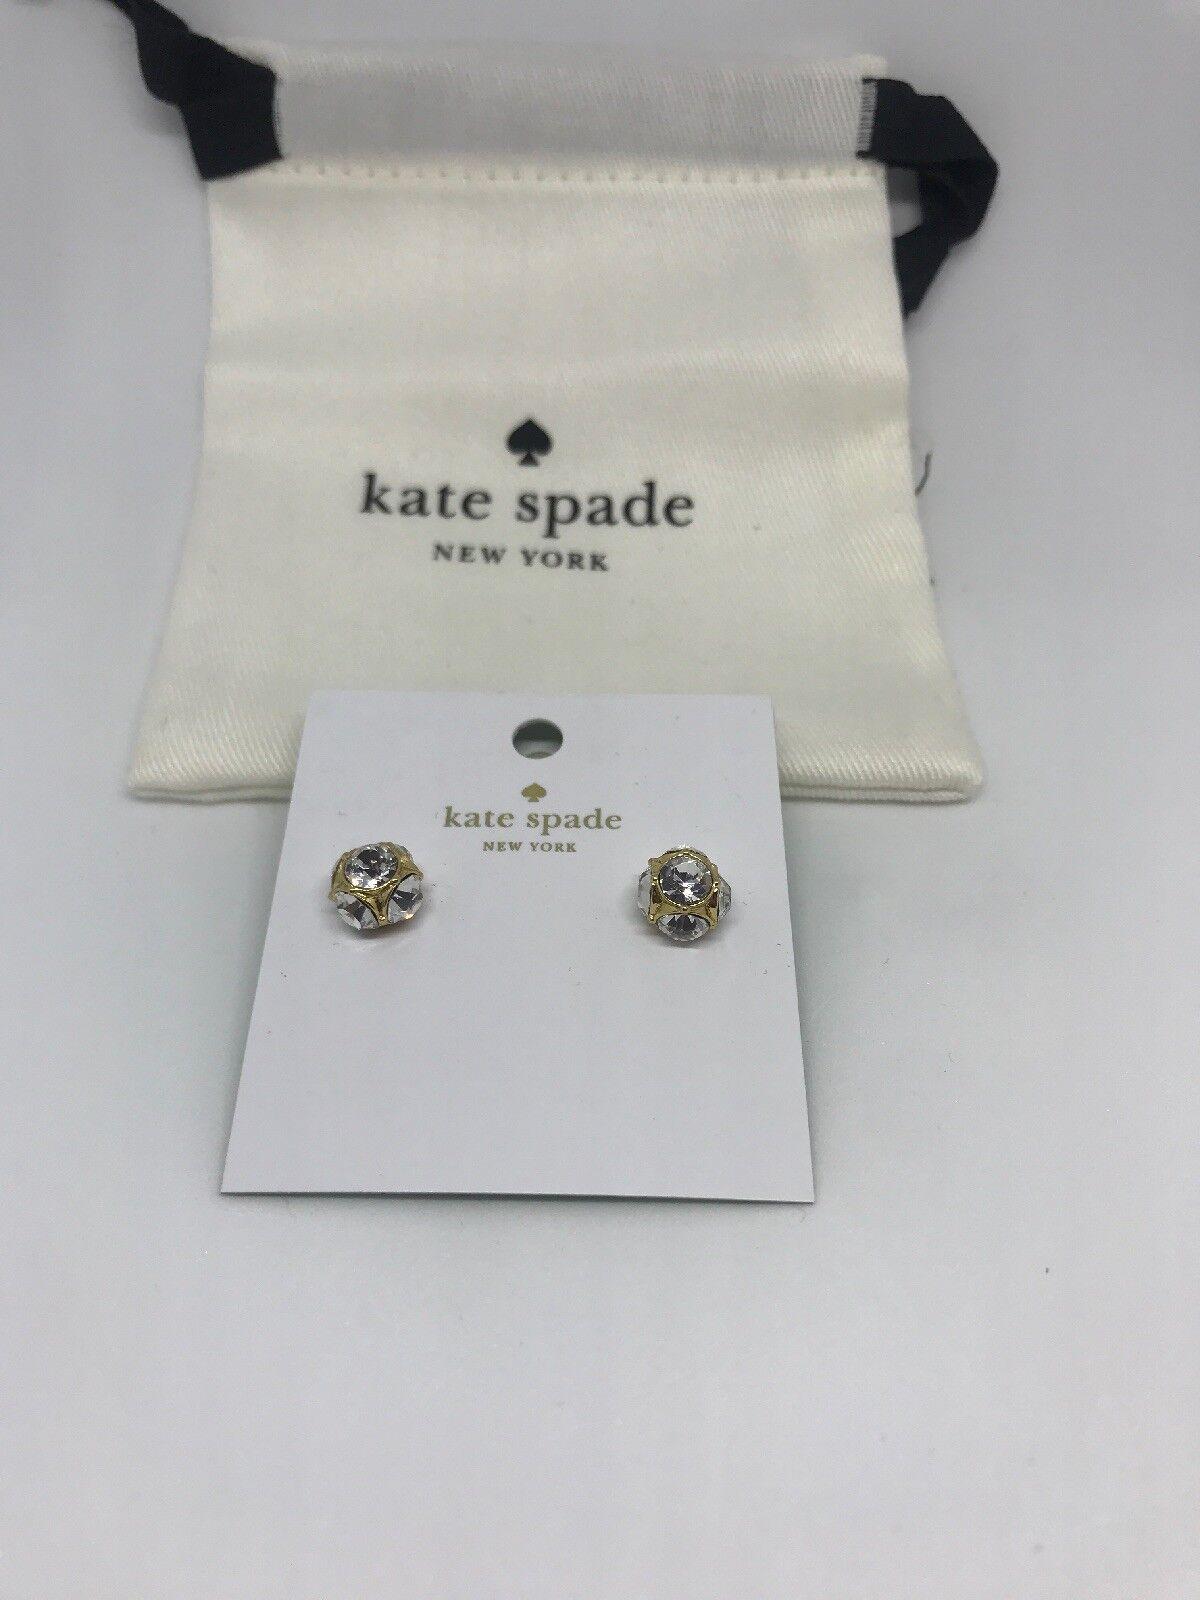 97da0894af4a2 Kate Spade Lady Marmalade Studs Earrings Clear Gold Tone O0ru1145